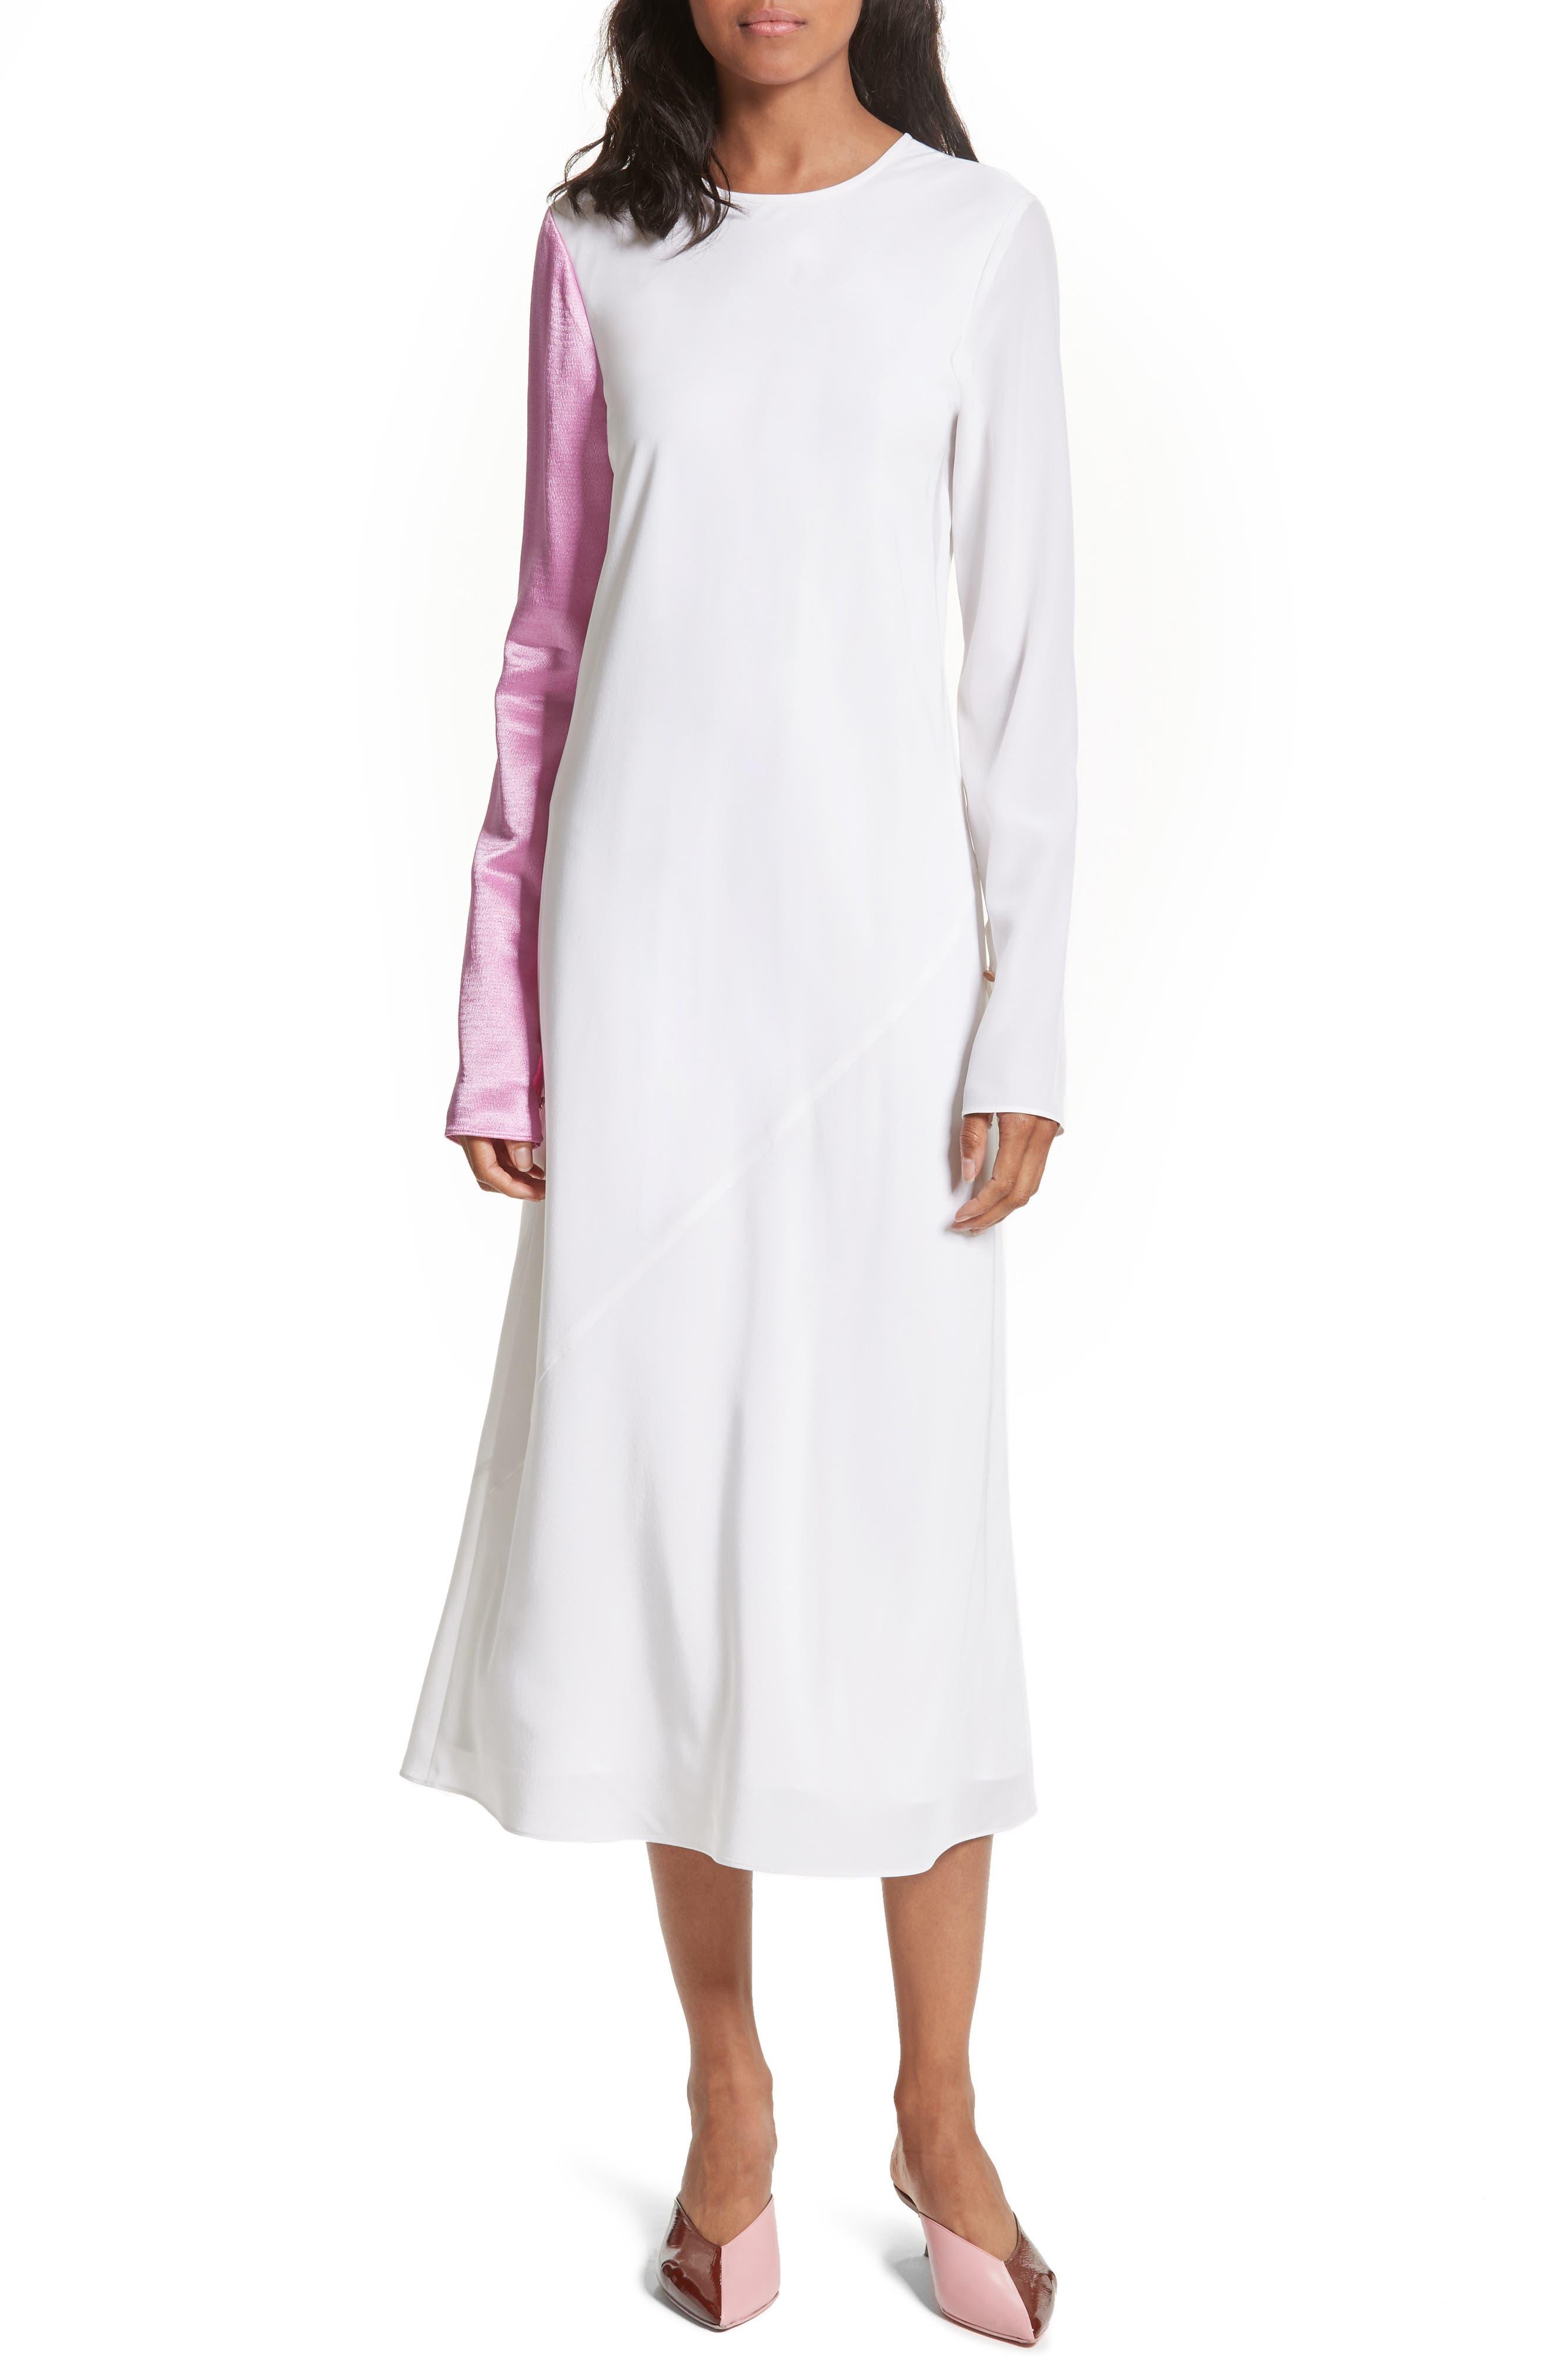 Main Image - Tibi Colorblock Silk Sleeve Dress